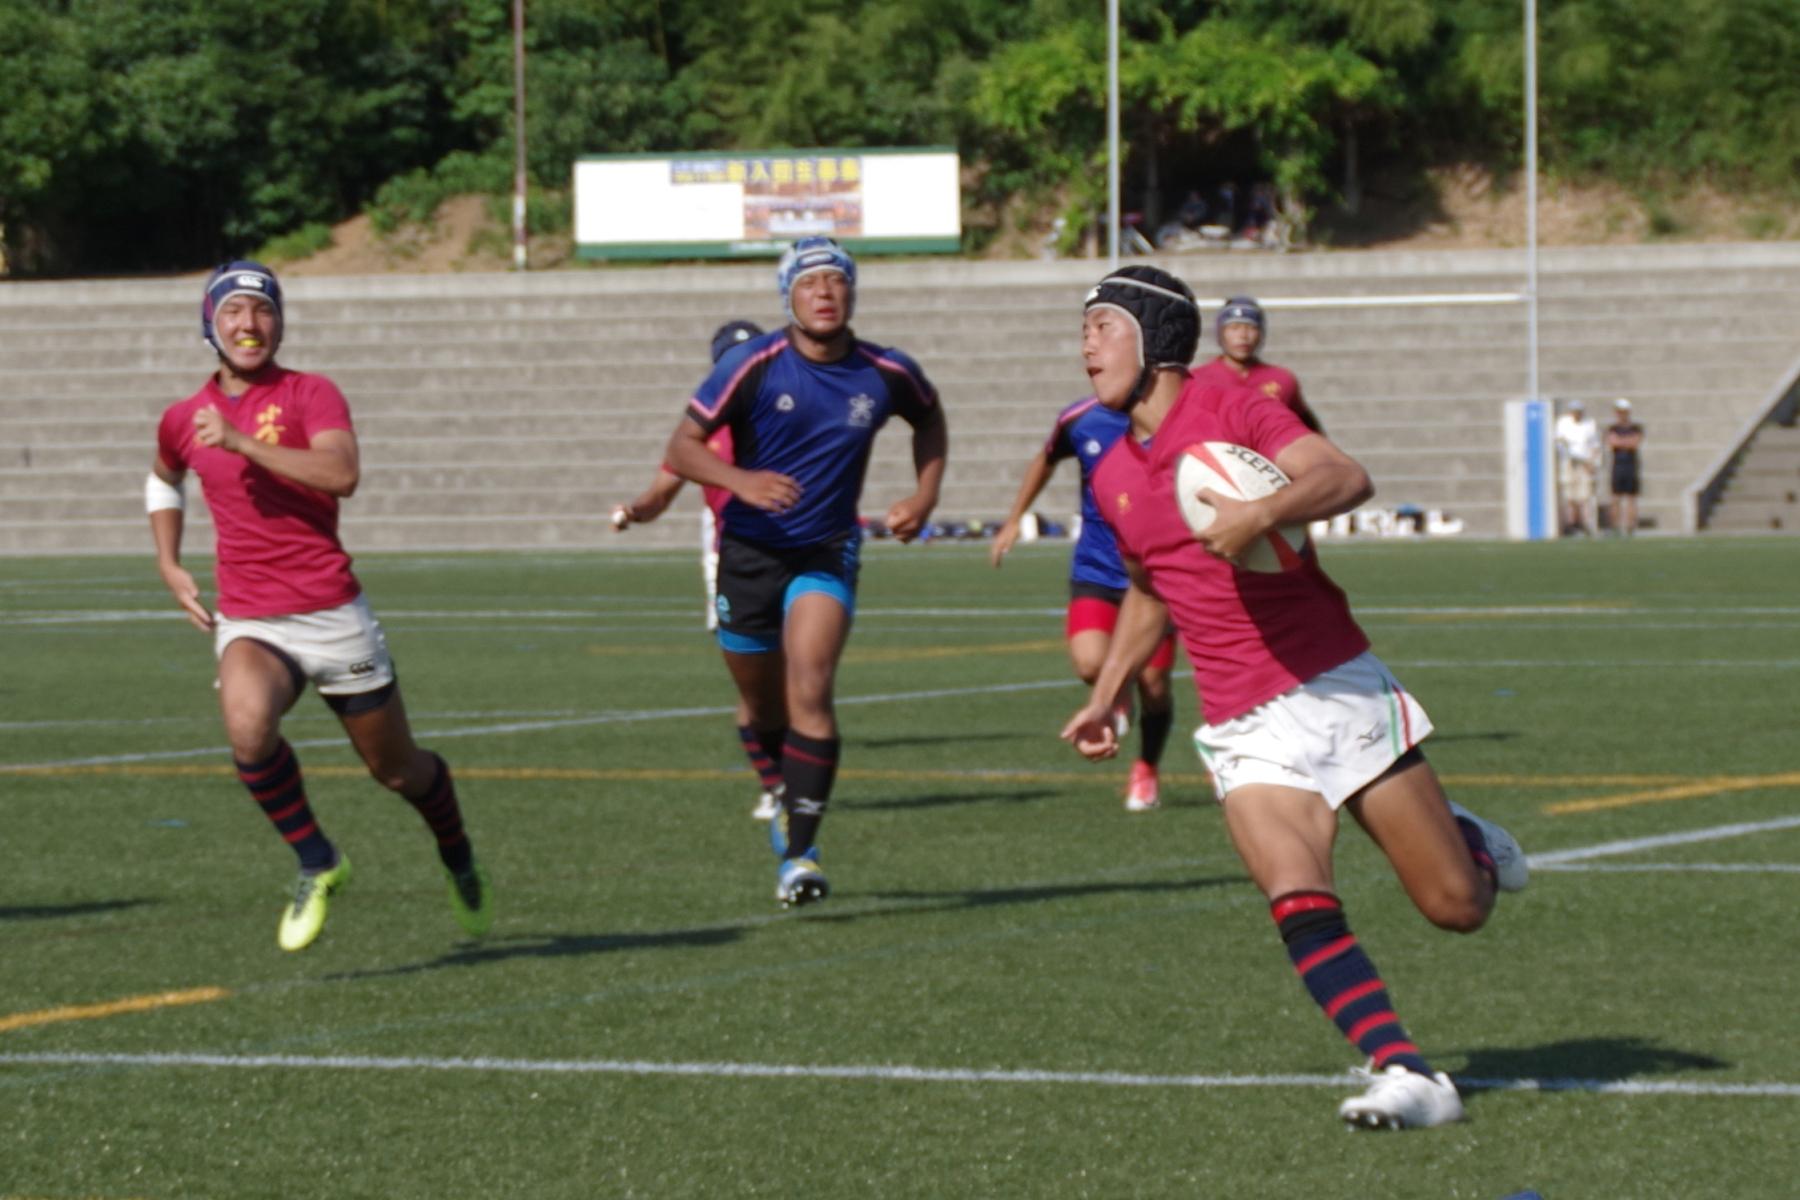 http://kokura-rugby.sakura.ne.jp/180807_160032_0036.jpg